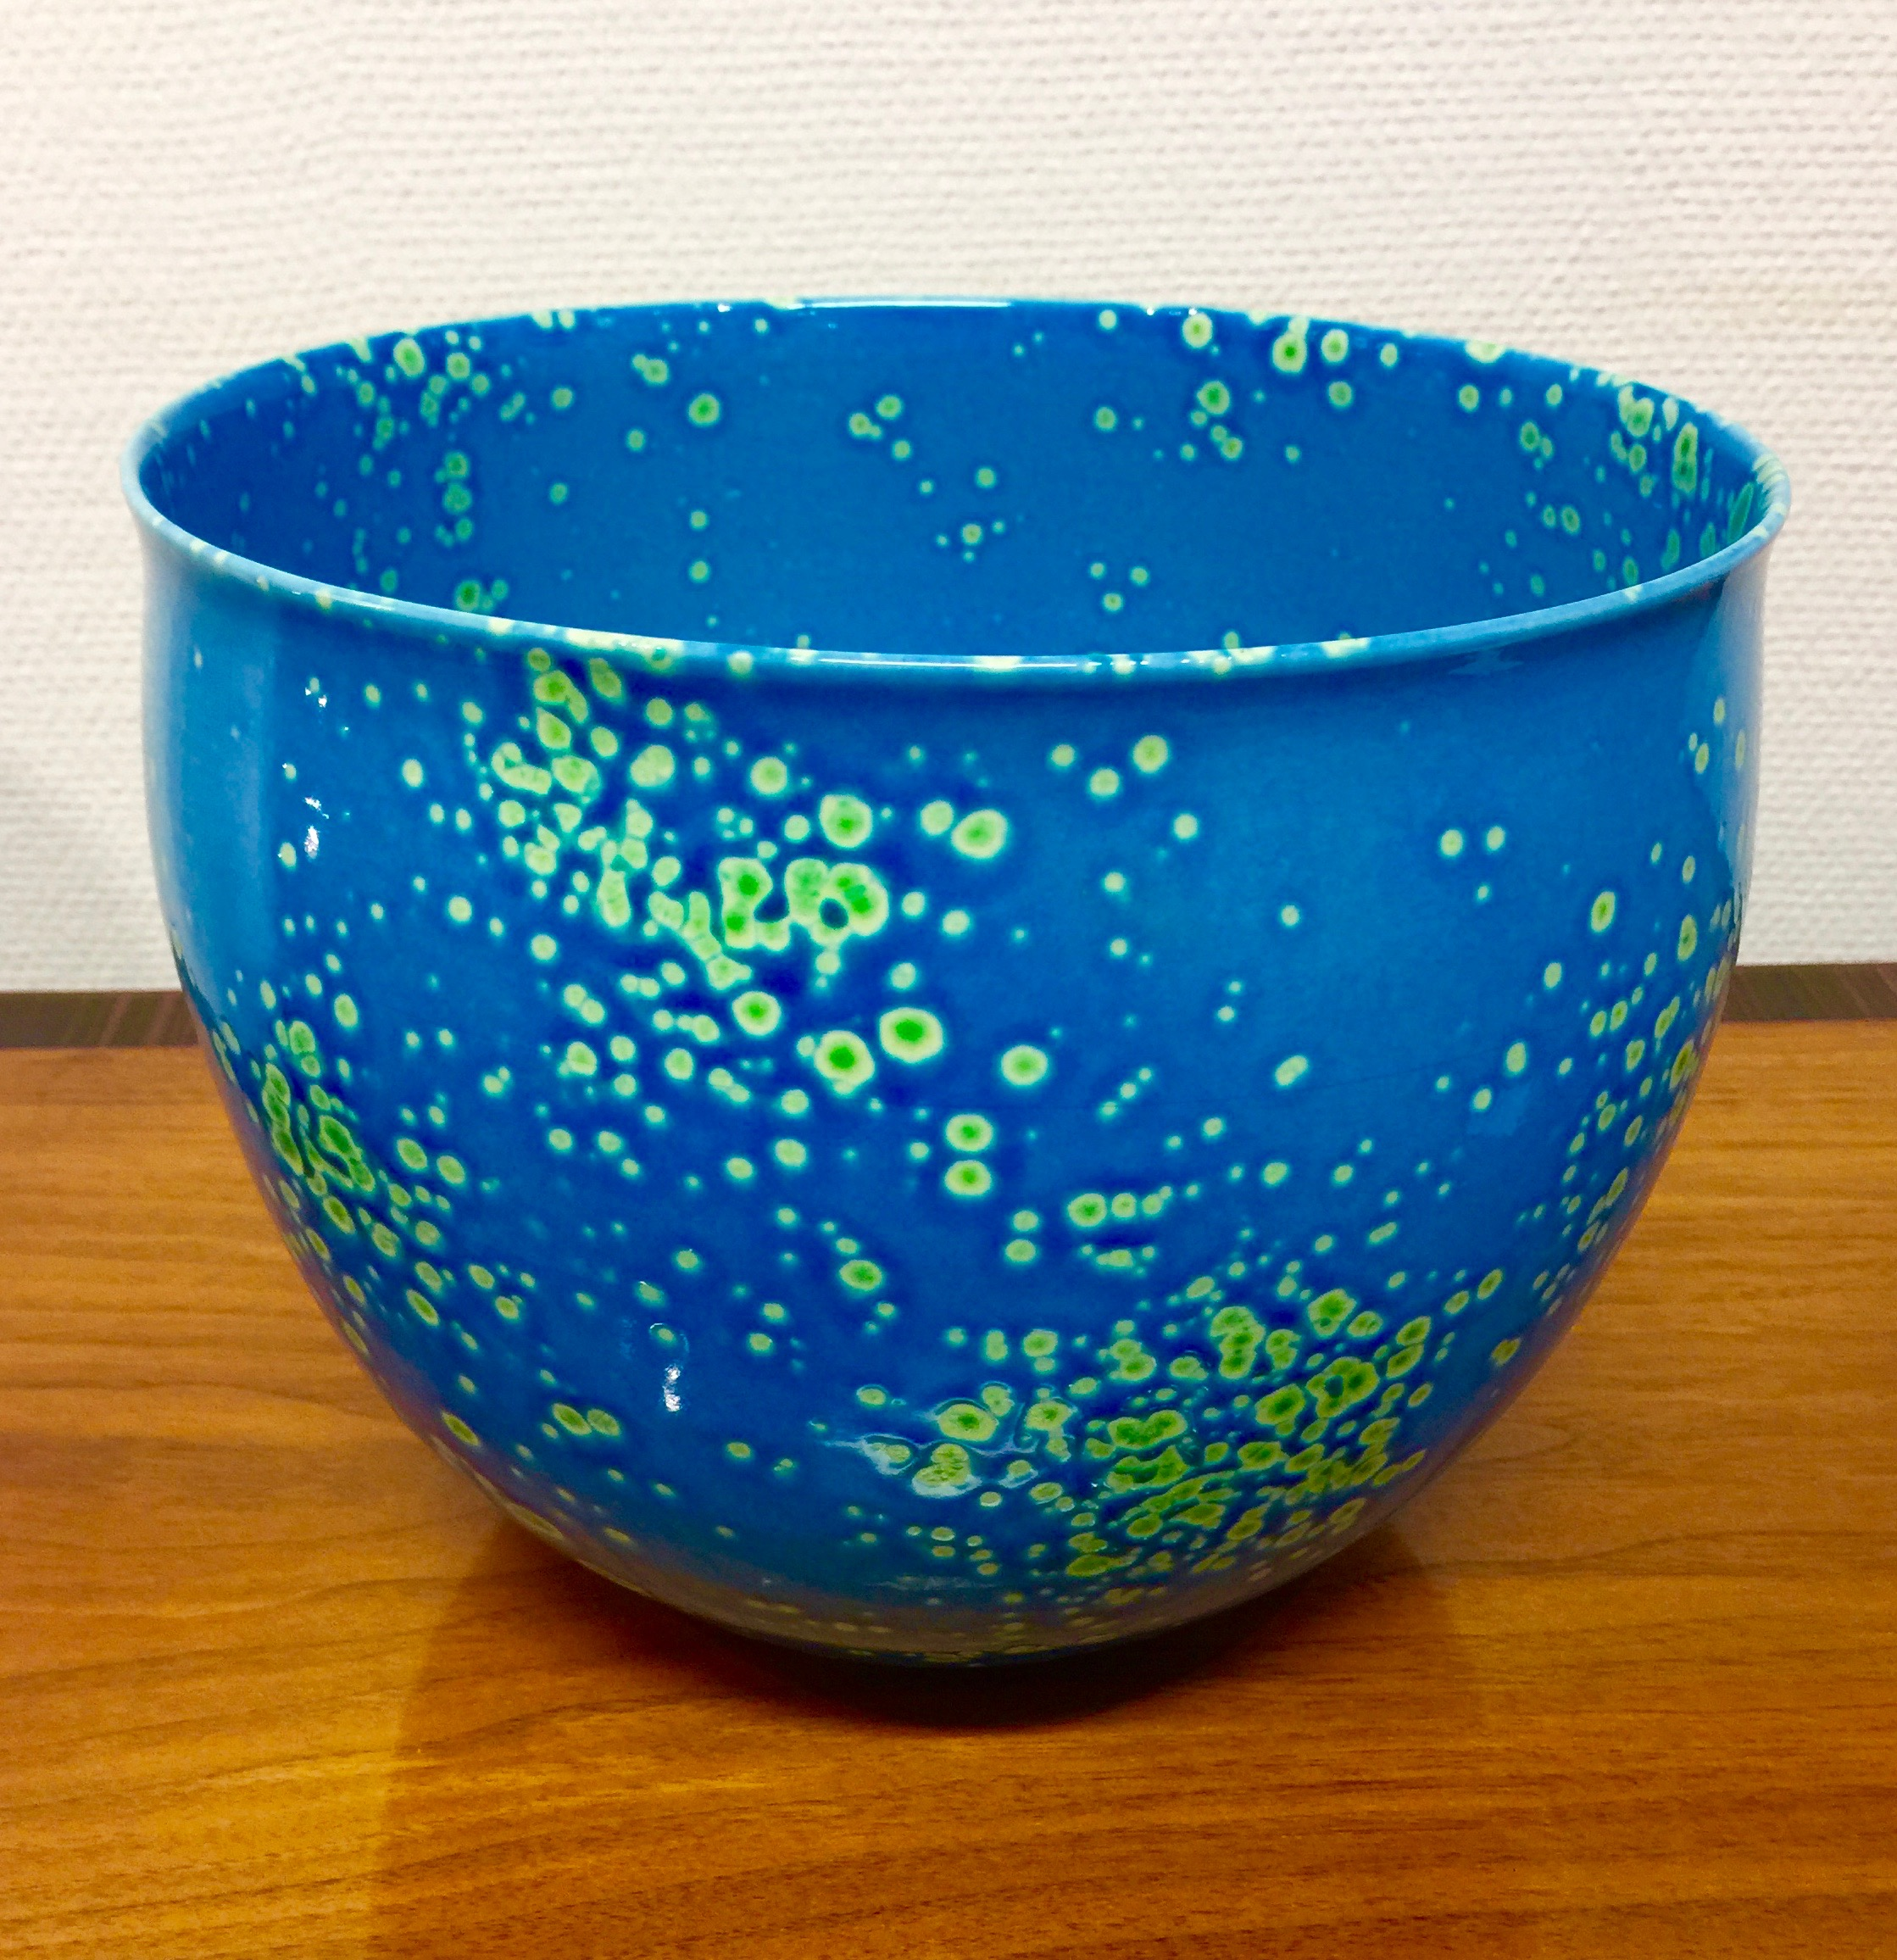 Per Hammarström - Large porcelain bowl